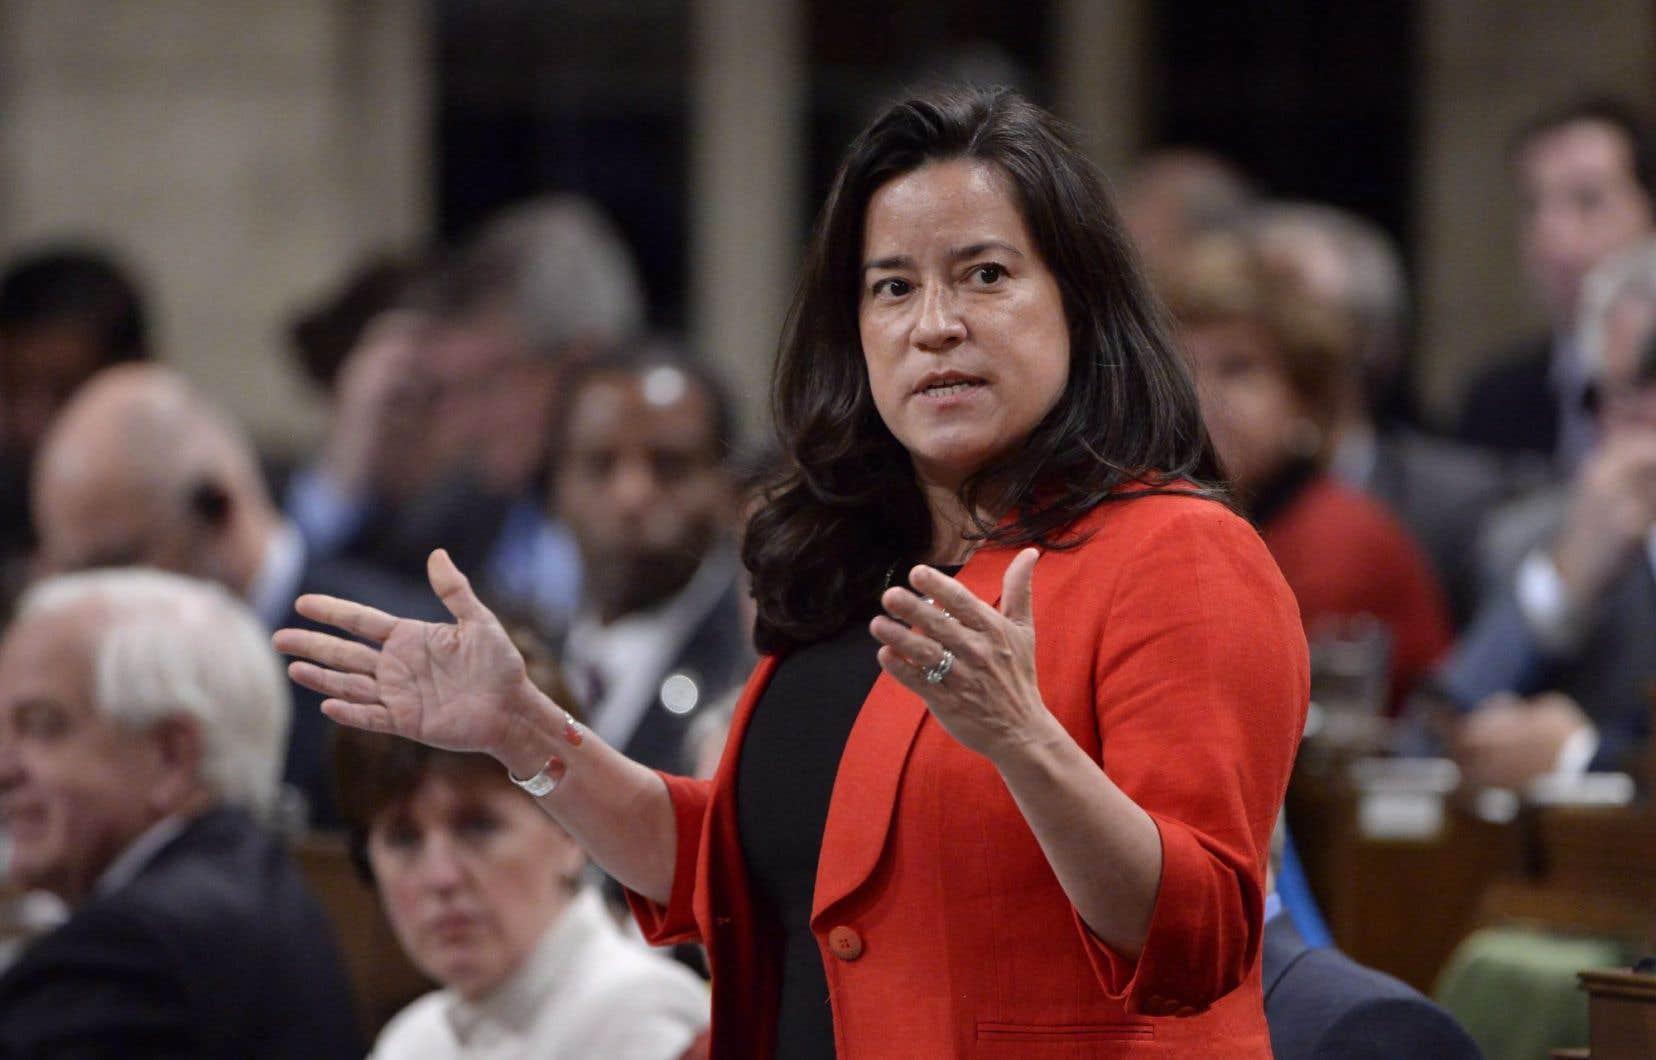 La ministre de la Justice du Canada, Jody Wilson-Raybould